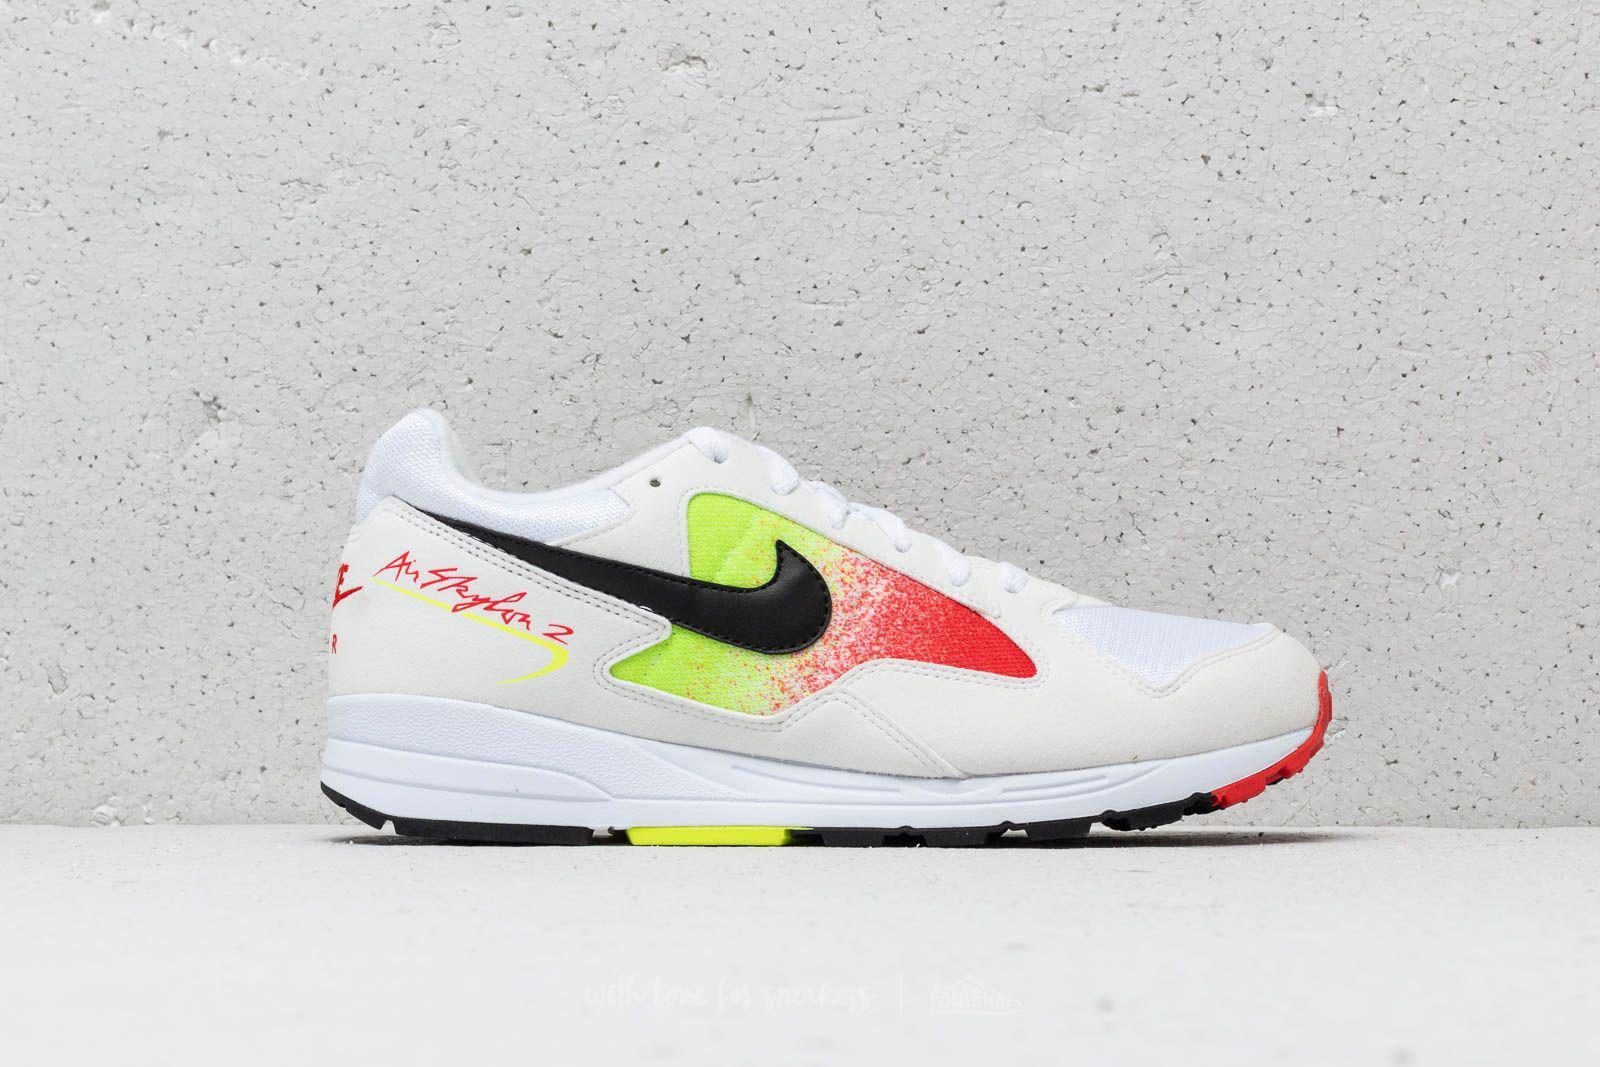 Lyst - Nike Air Skylon Ii White  Black-volt-habanero Red in White ... dae82f3e3